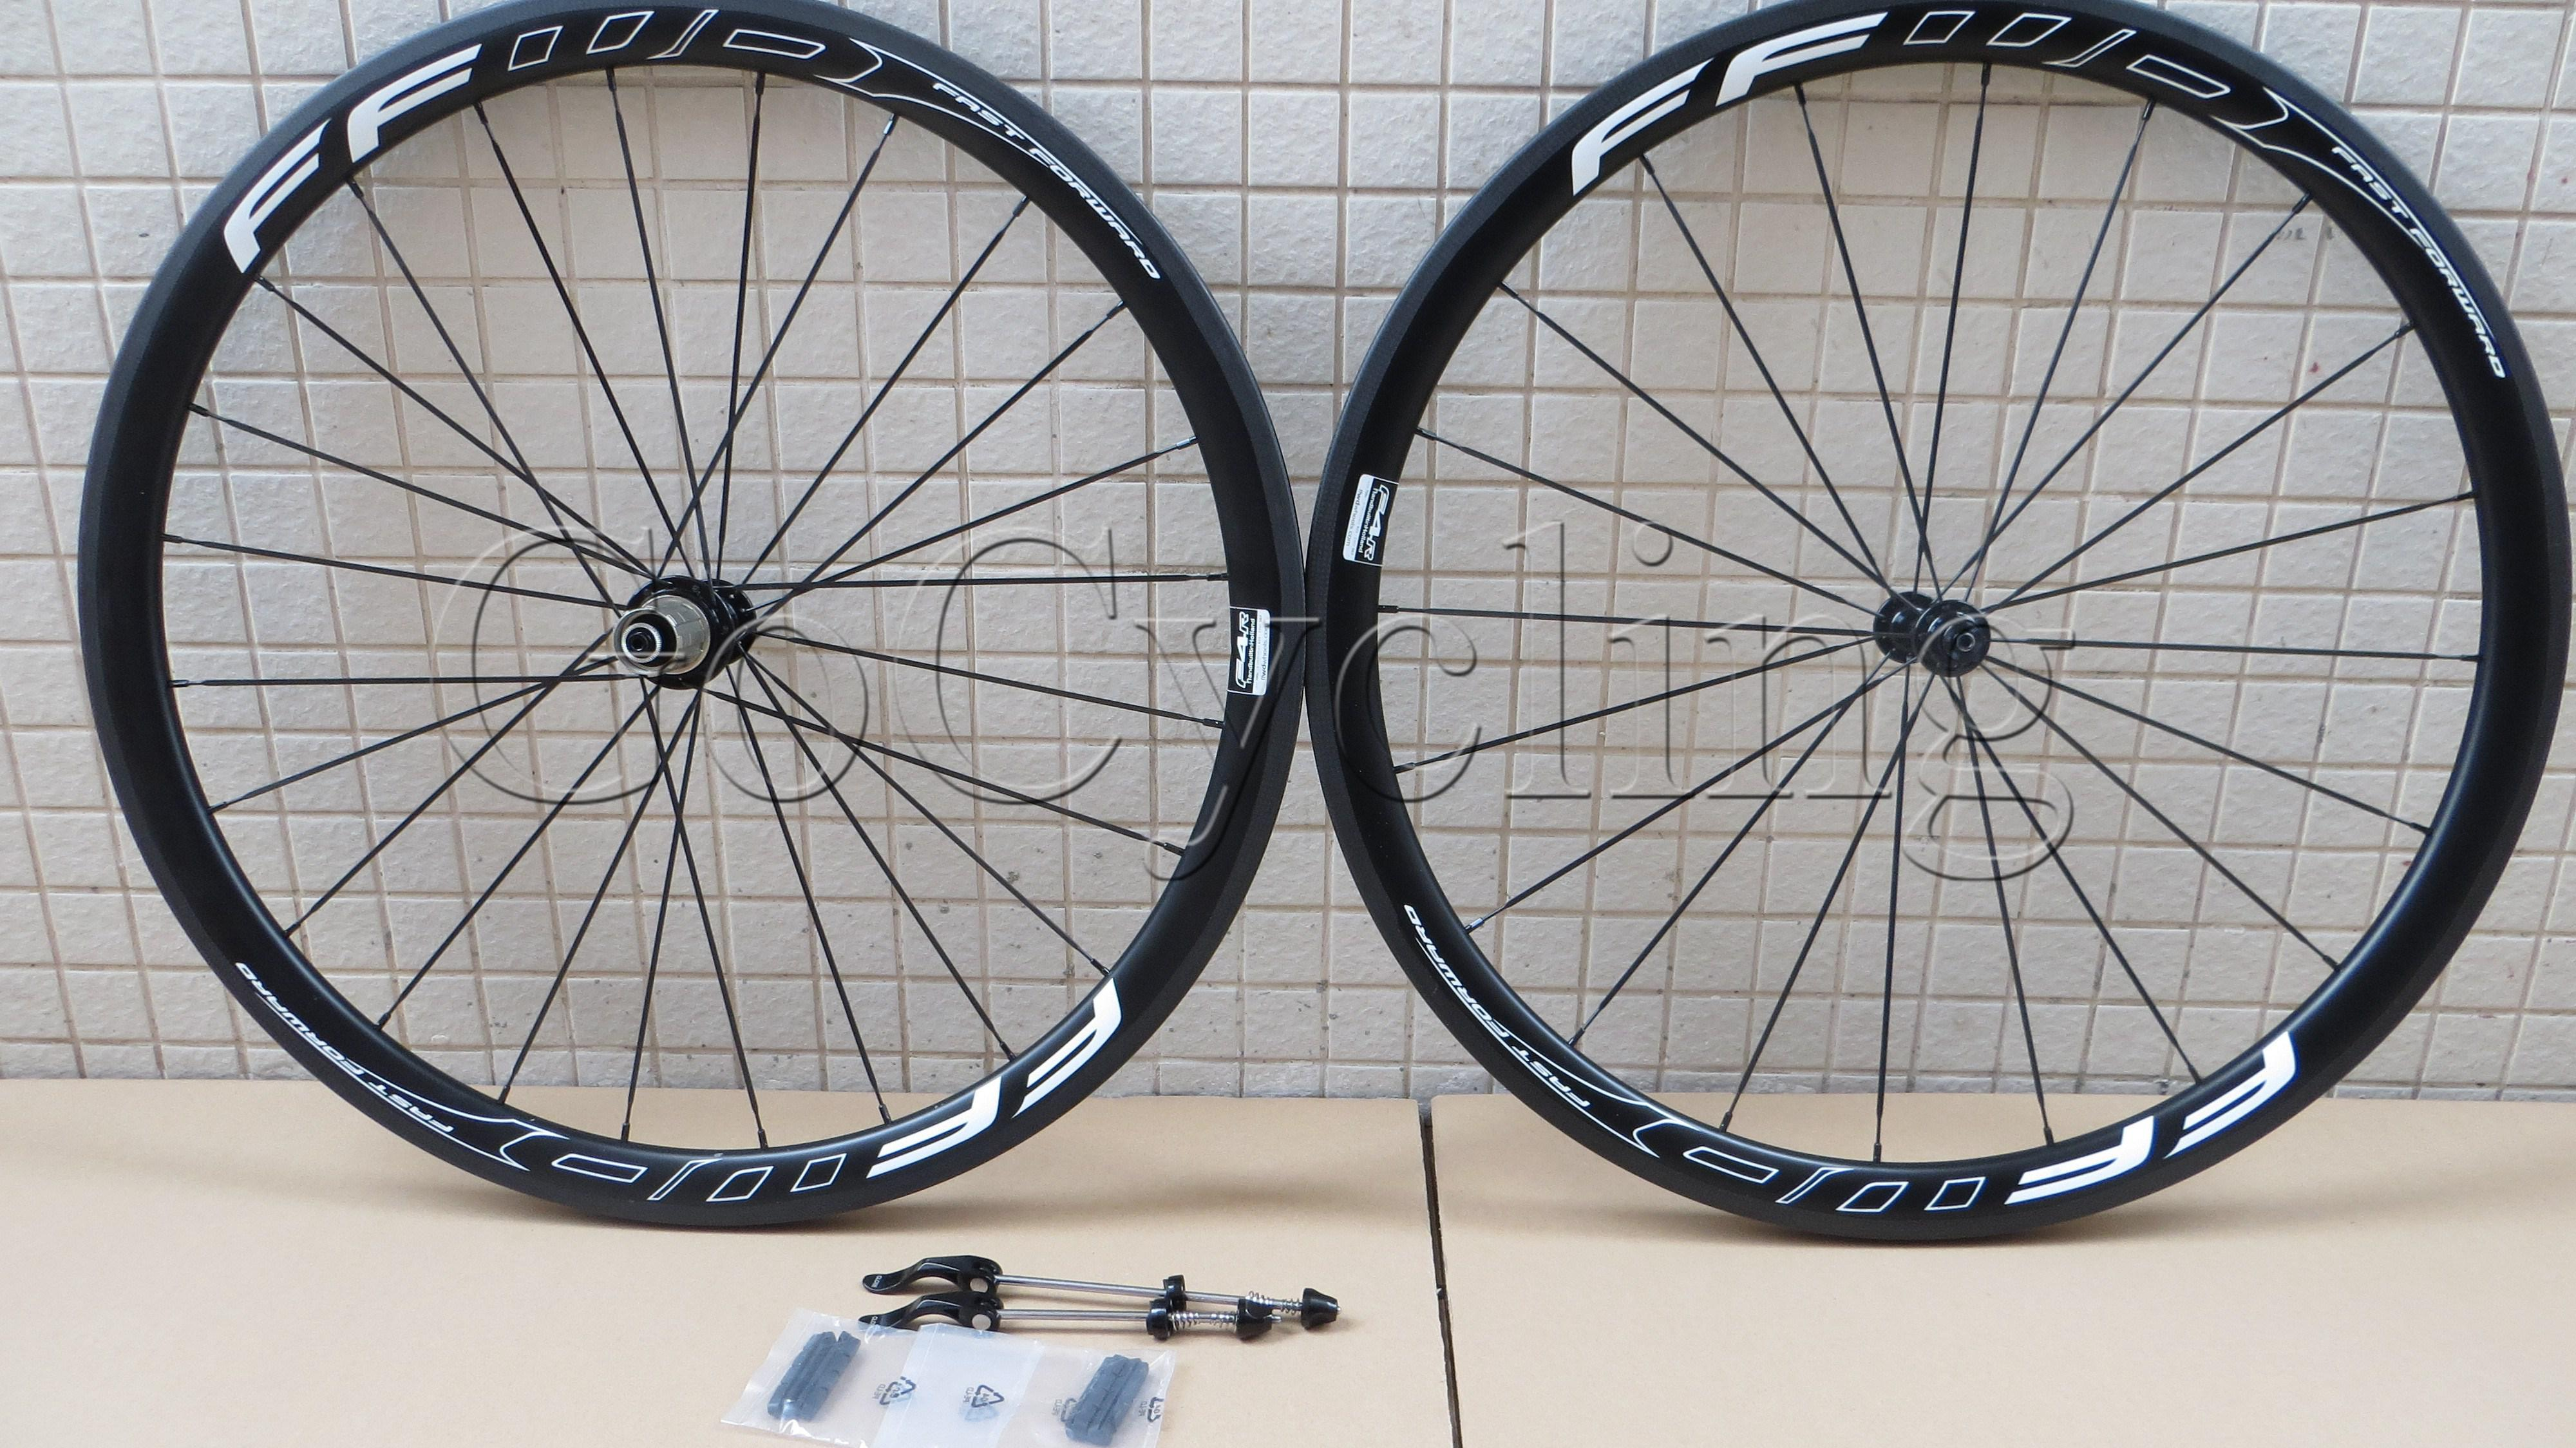 FFWD fast forward F4R 38mm carbon bicycle wheels clincher tubular road bike wheelset basalt braking surface white and black UD matt